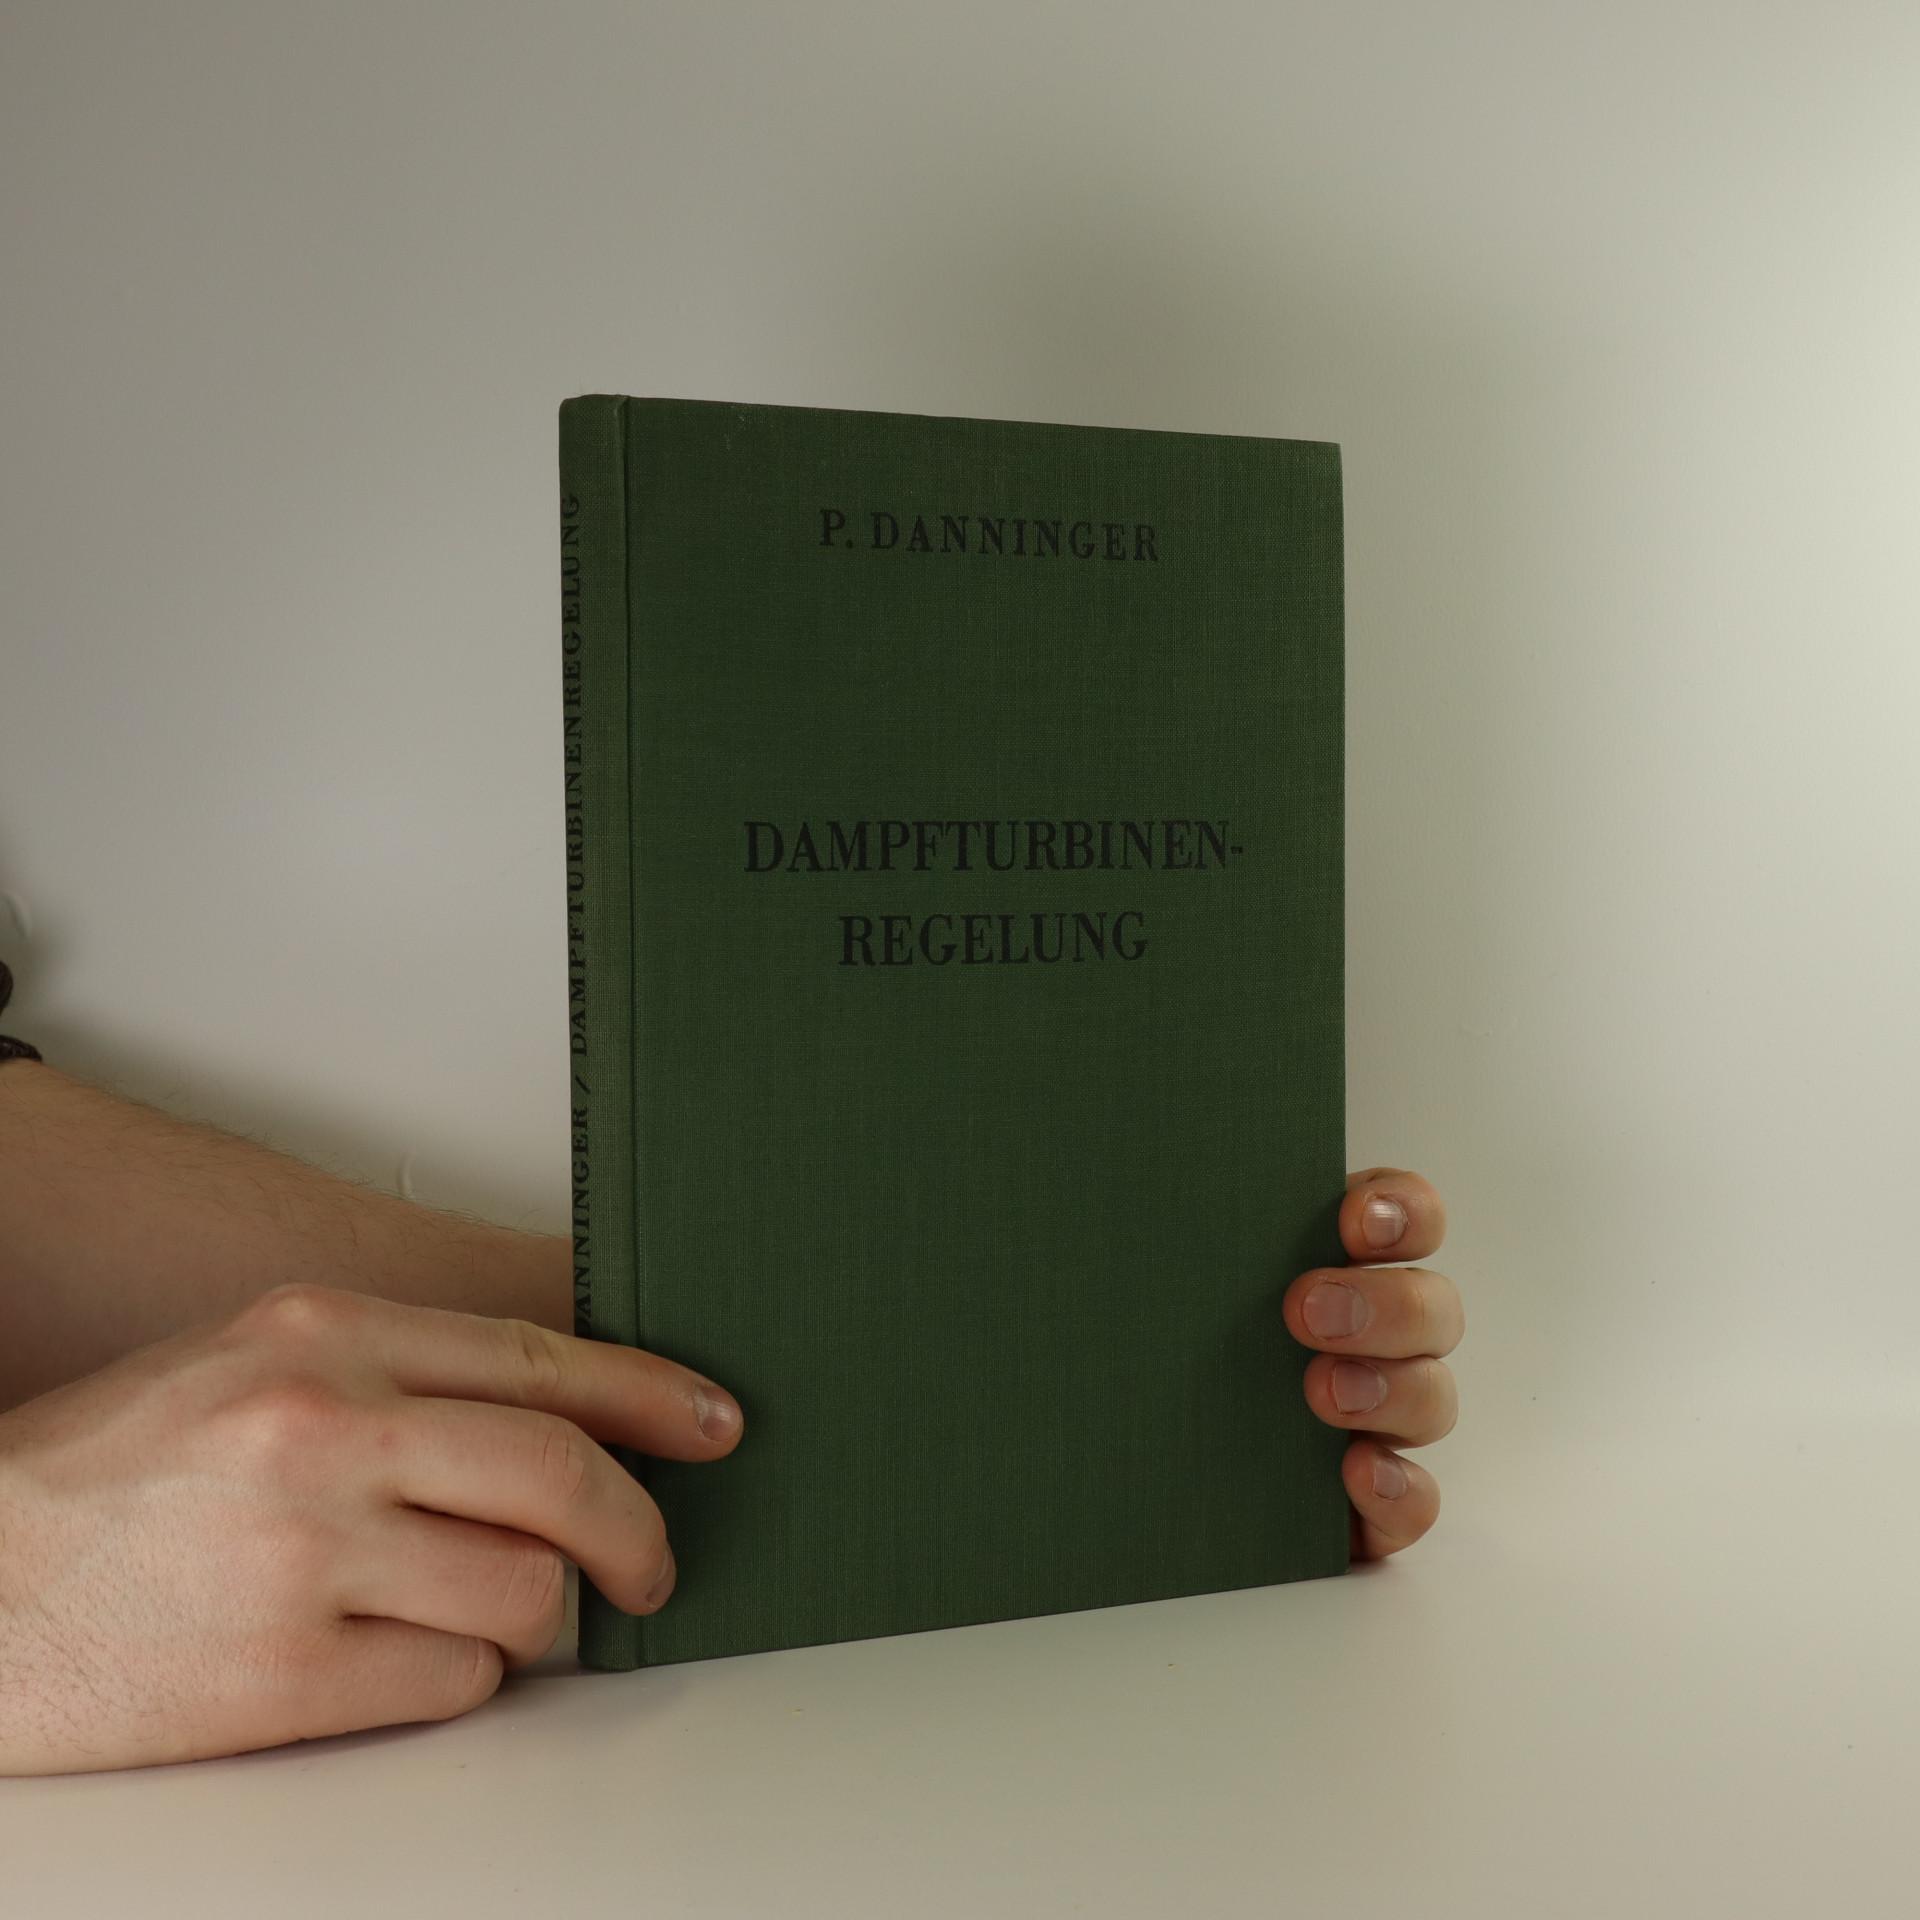 antikvární kniha Die Dampfturbinenregelung, 1934